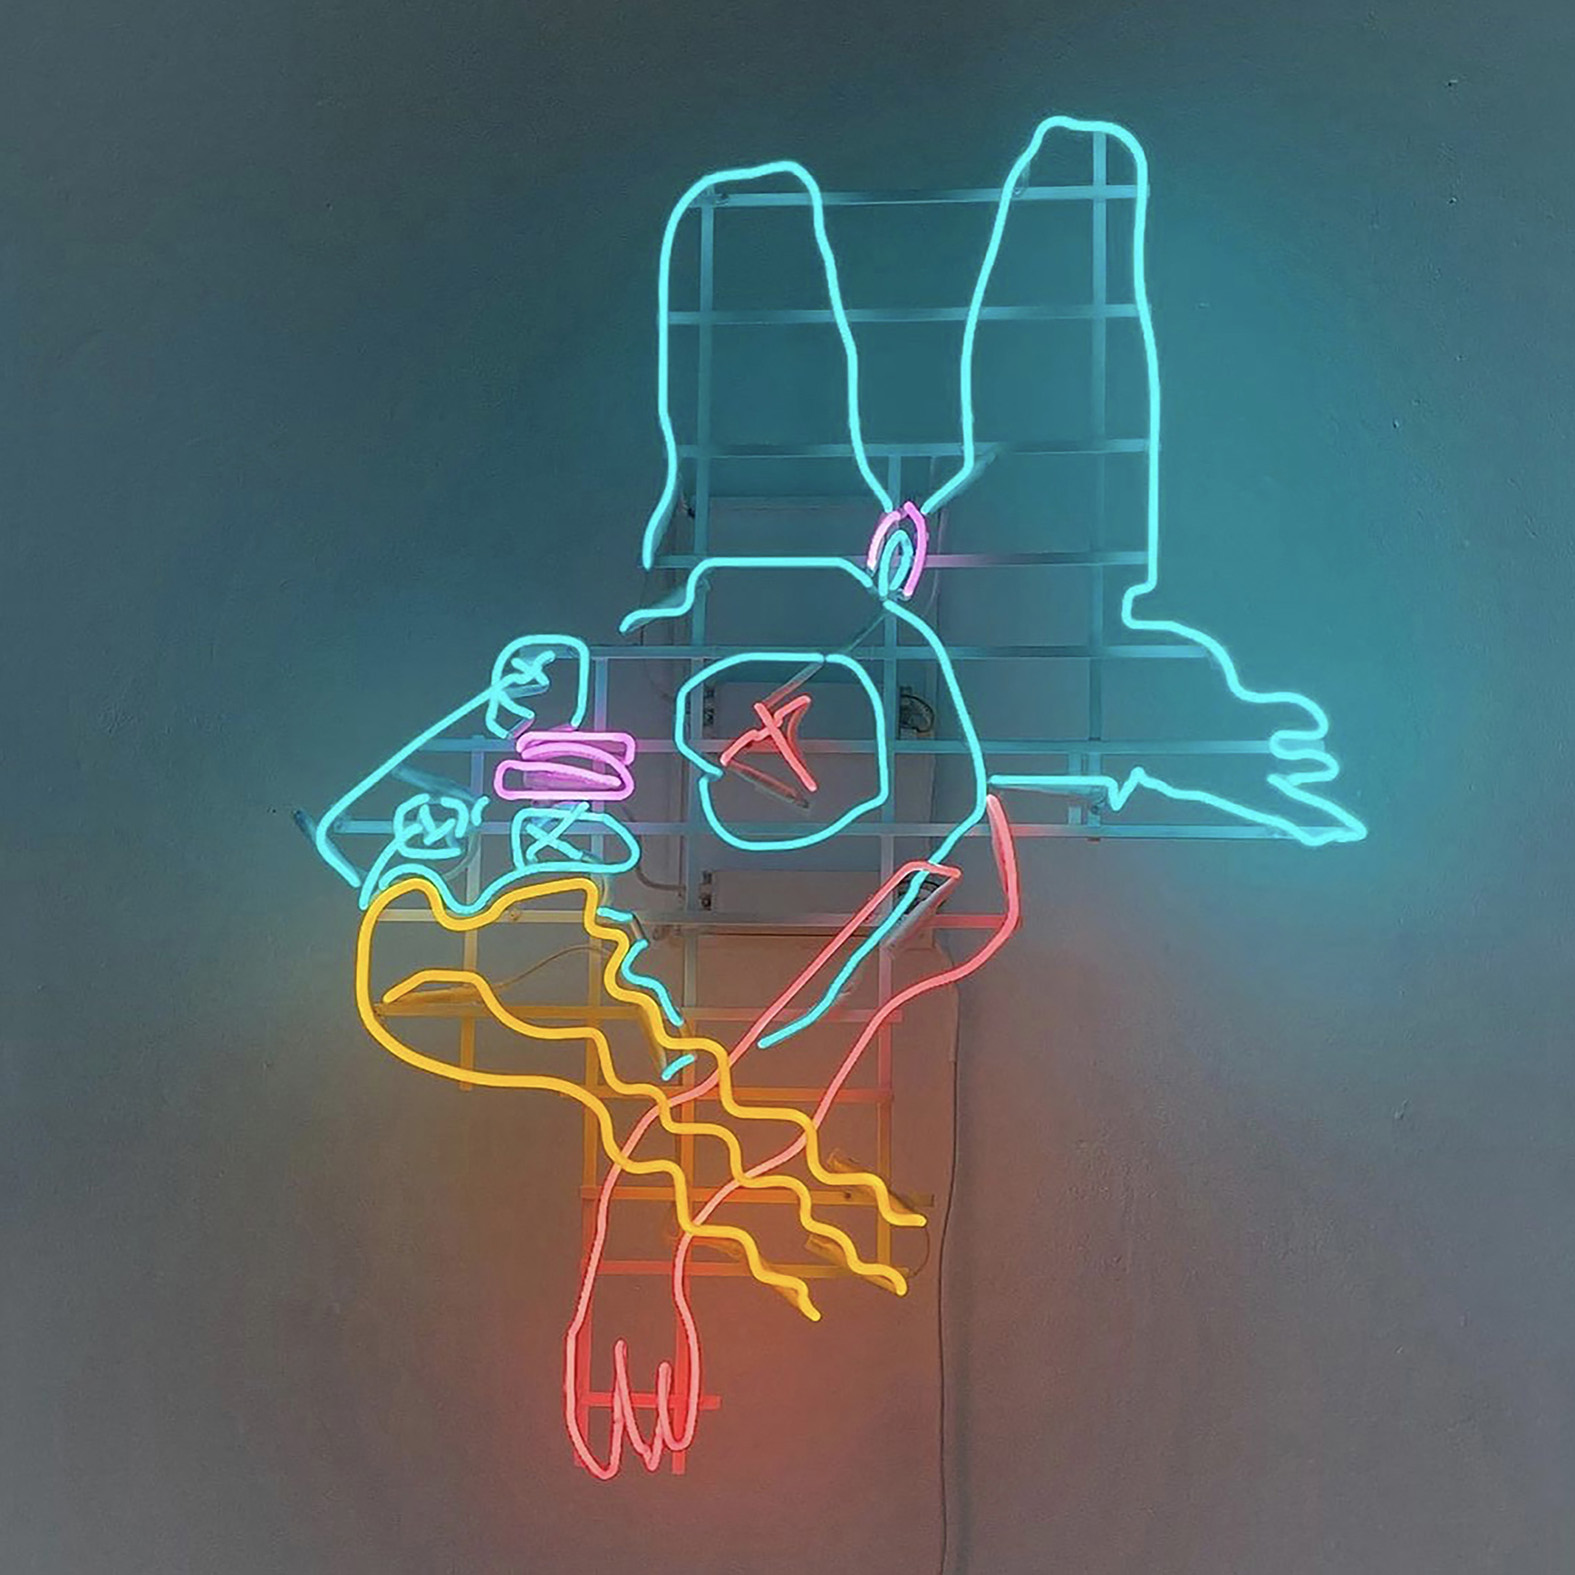 11_Anna-Nezhnaya_Down-the-rabbit-hole-2021_neon-tubes_110x83_web